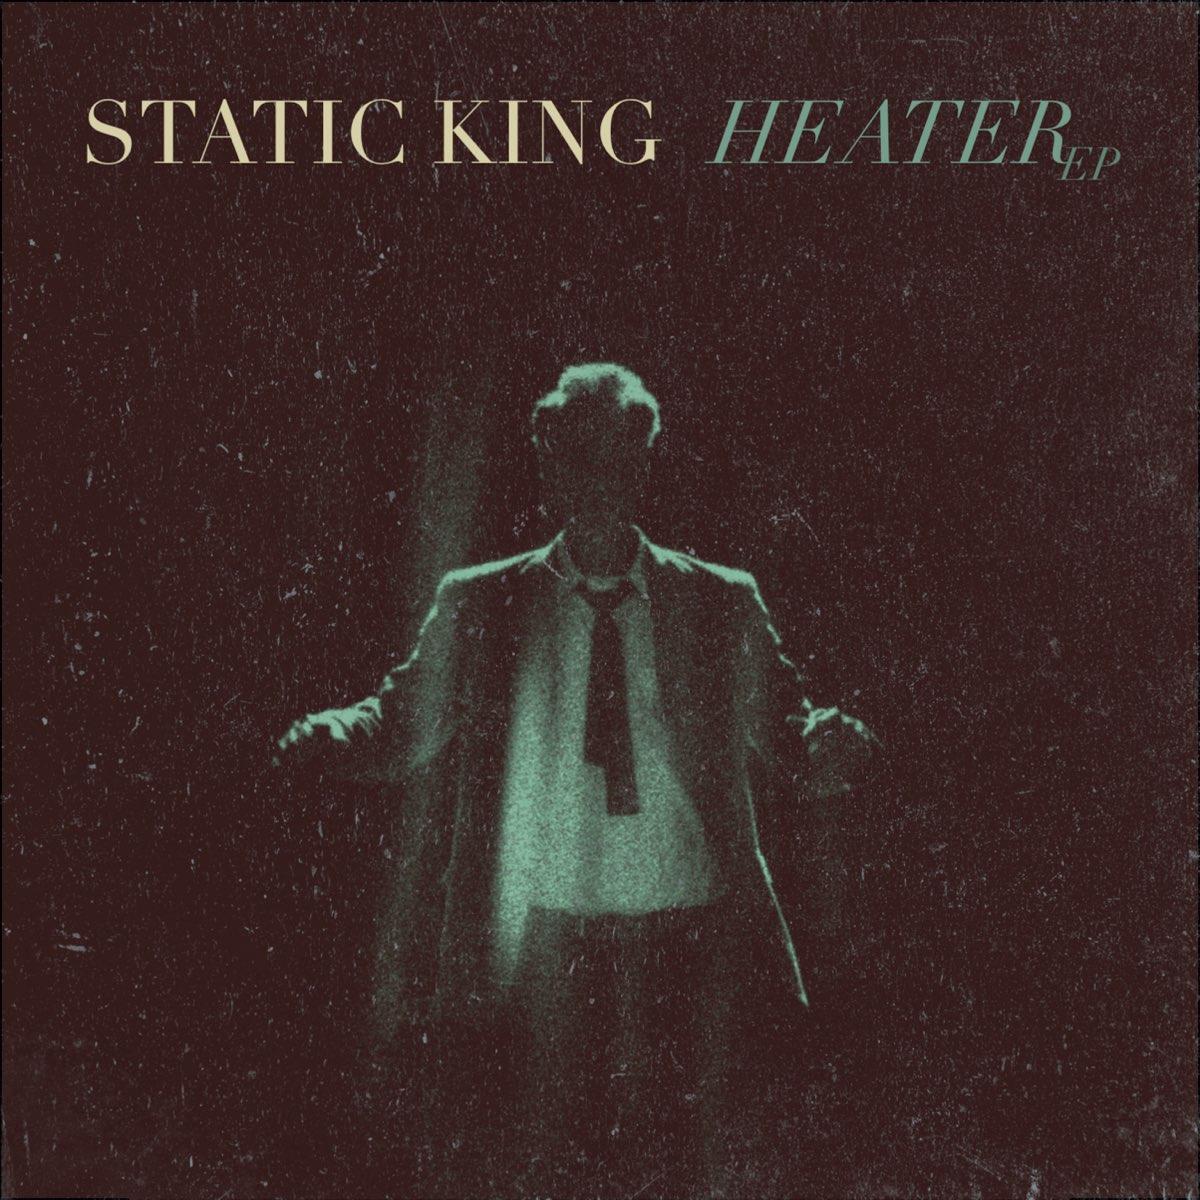 Static King Heater